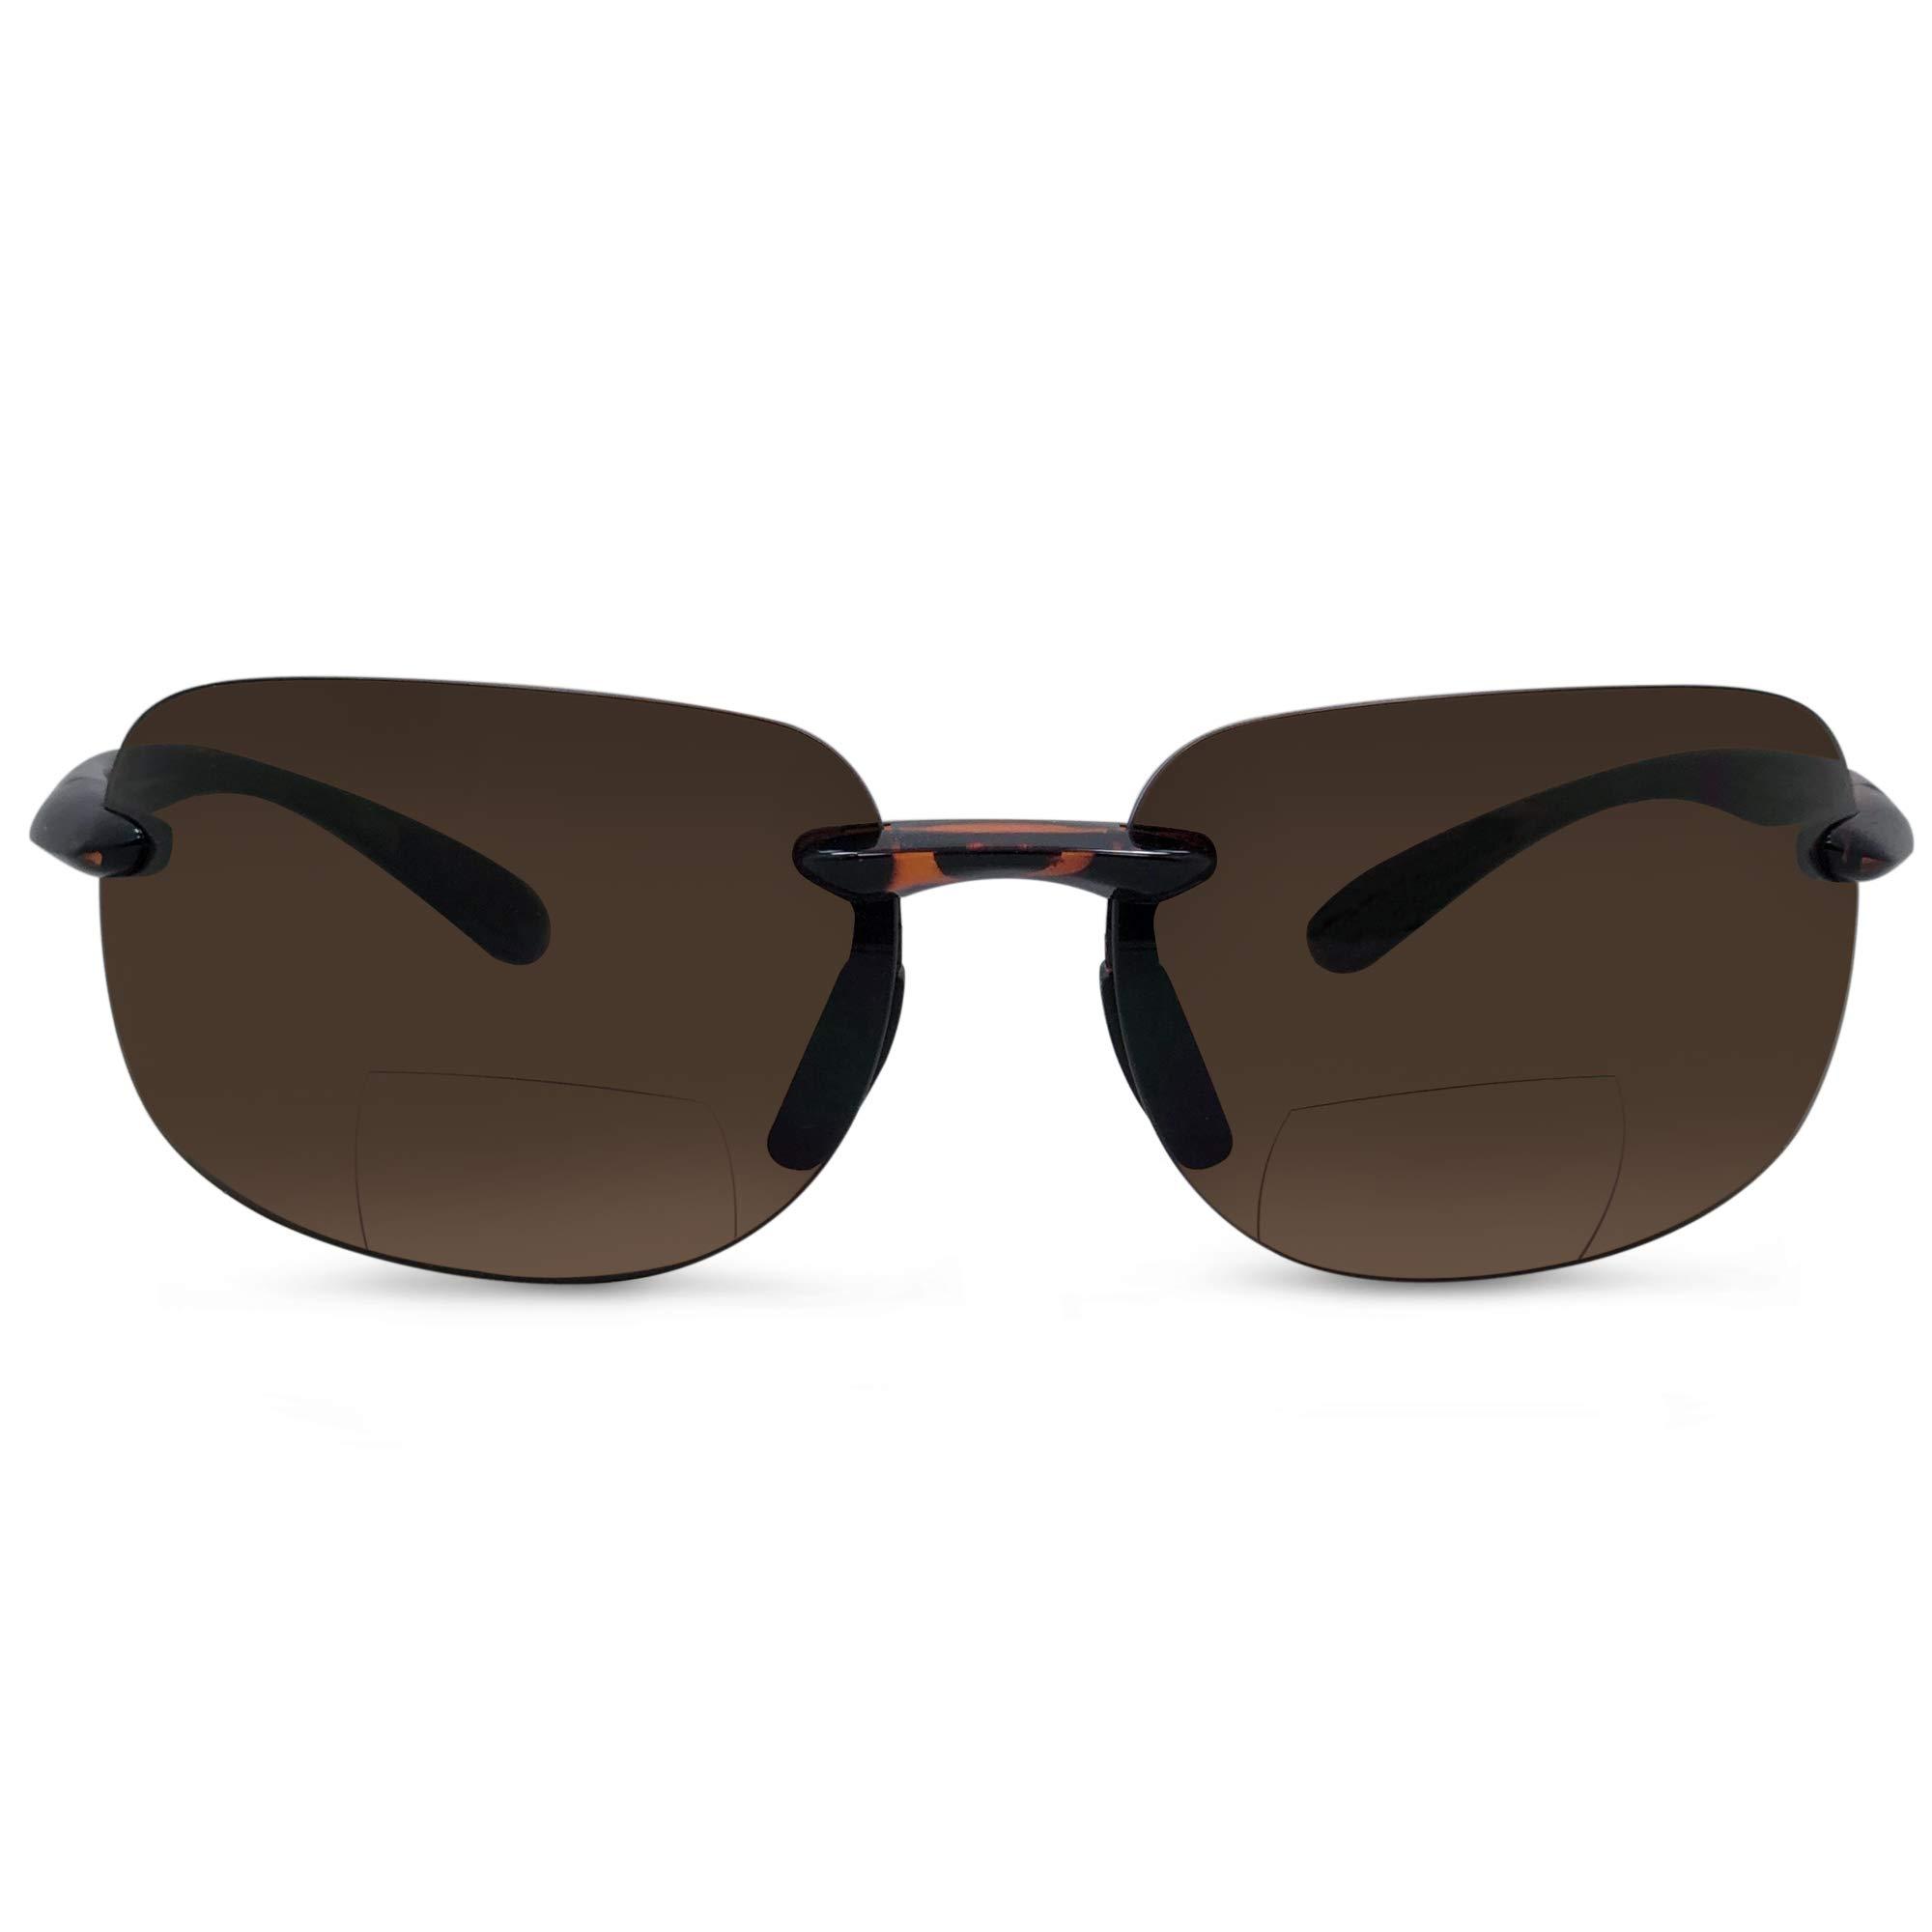 In Style Eyes Lovin Maui Wrap Premium Polarized Bifocal Sunglasses tortoise 1.50